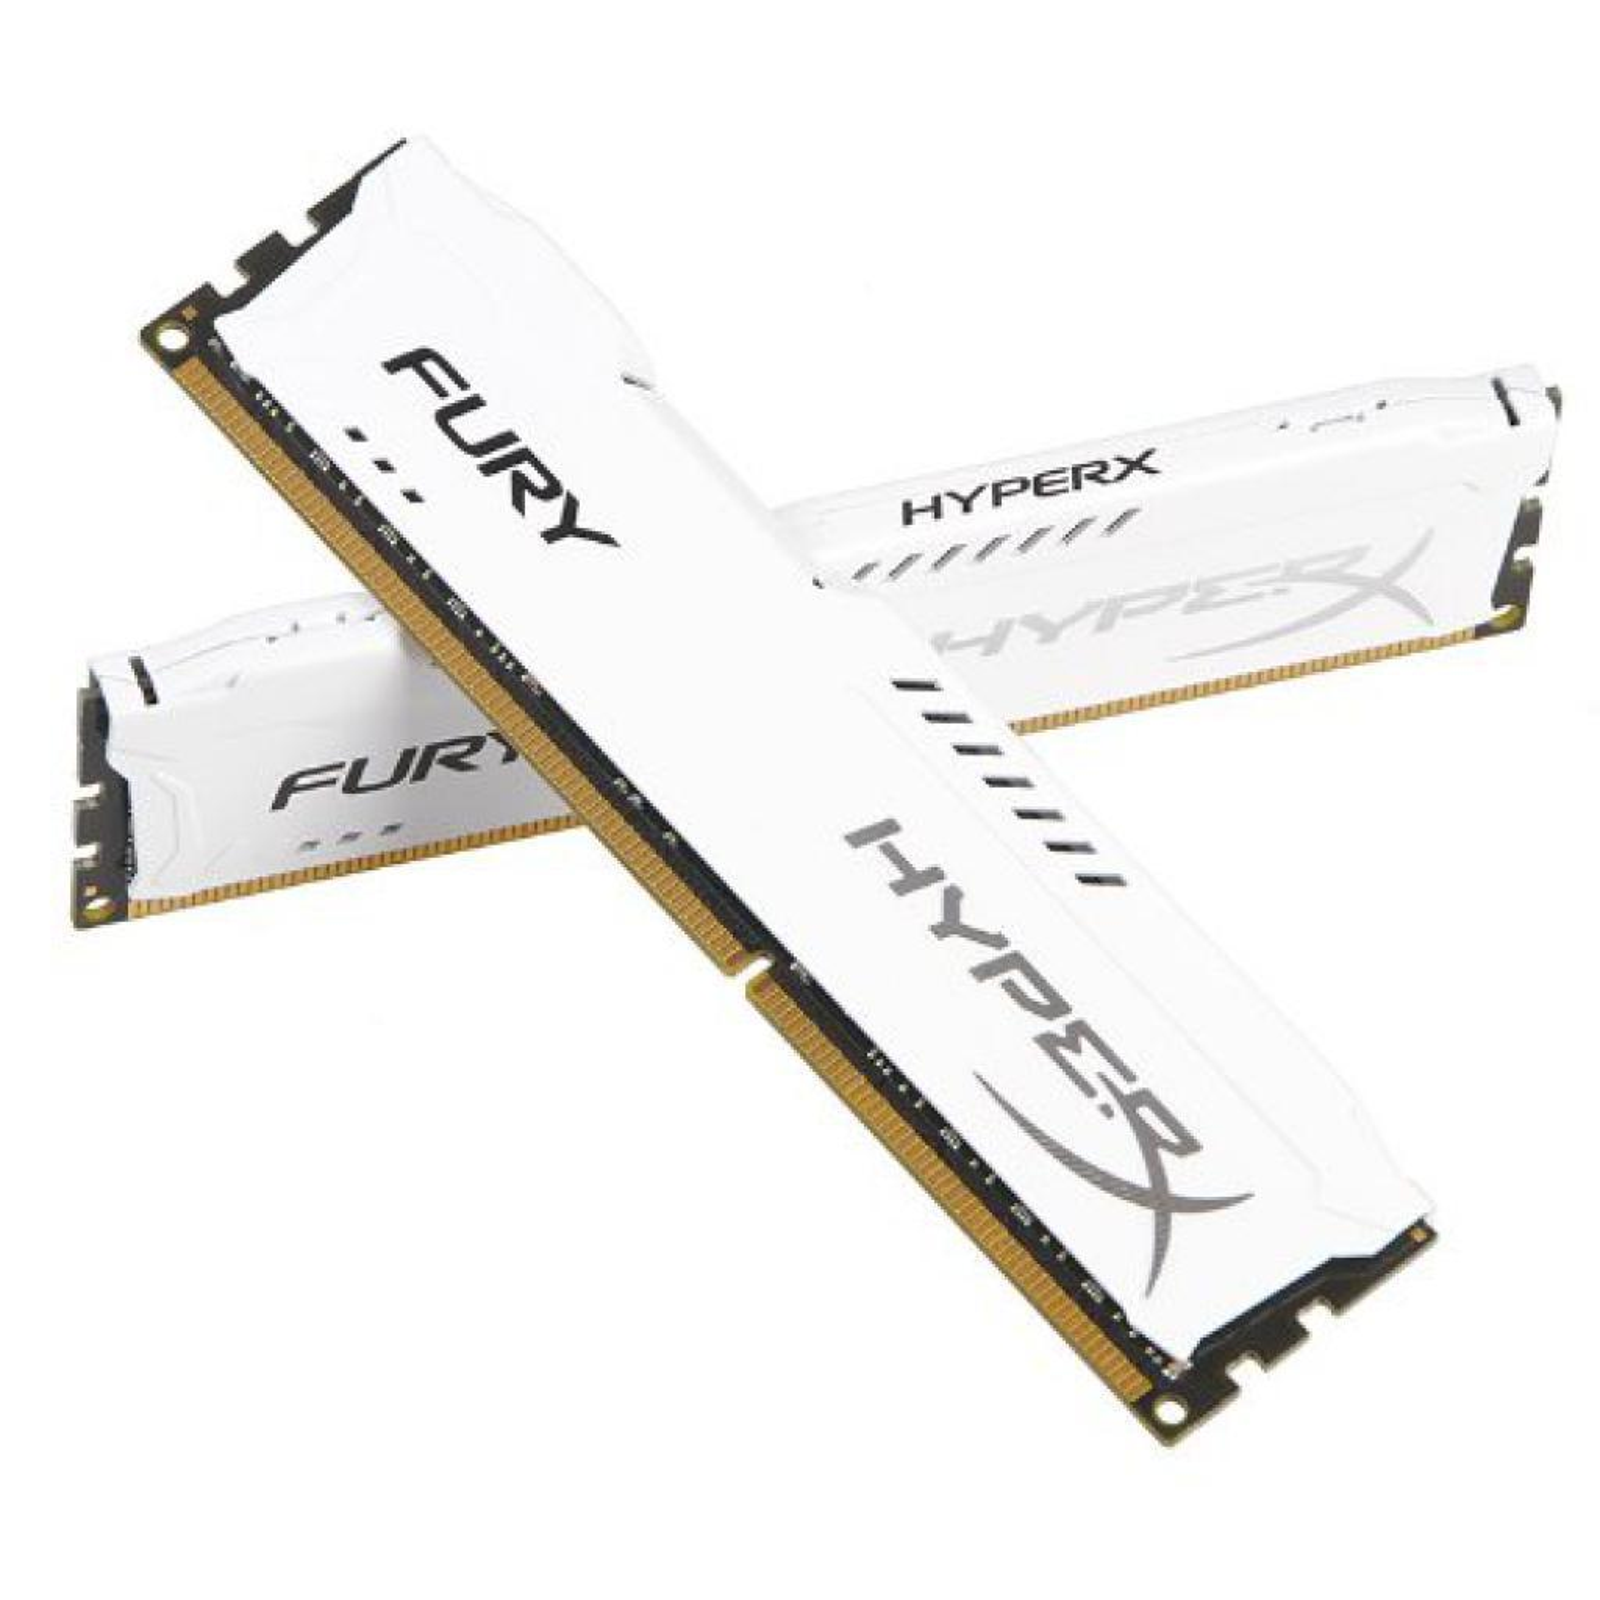 Модуль памяти для компьютера DDR4 16GB (2x8GB) 3200 MHz HyperX FURY White HyperX (Kingston Fury) (HX432C18FW2K2/16) изображение 3